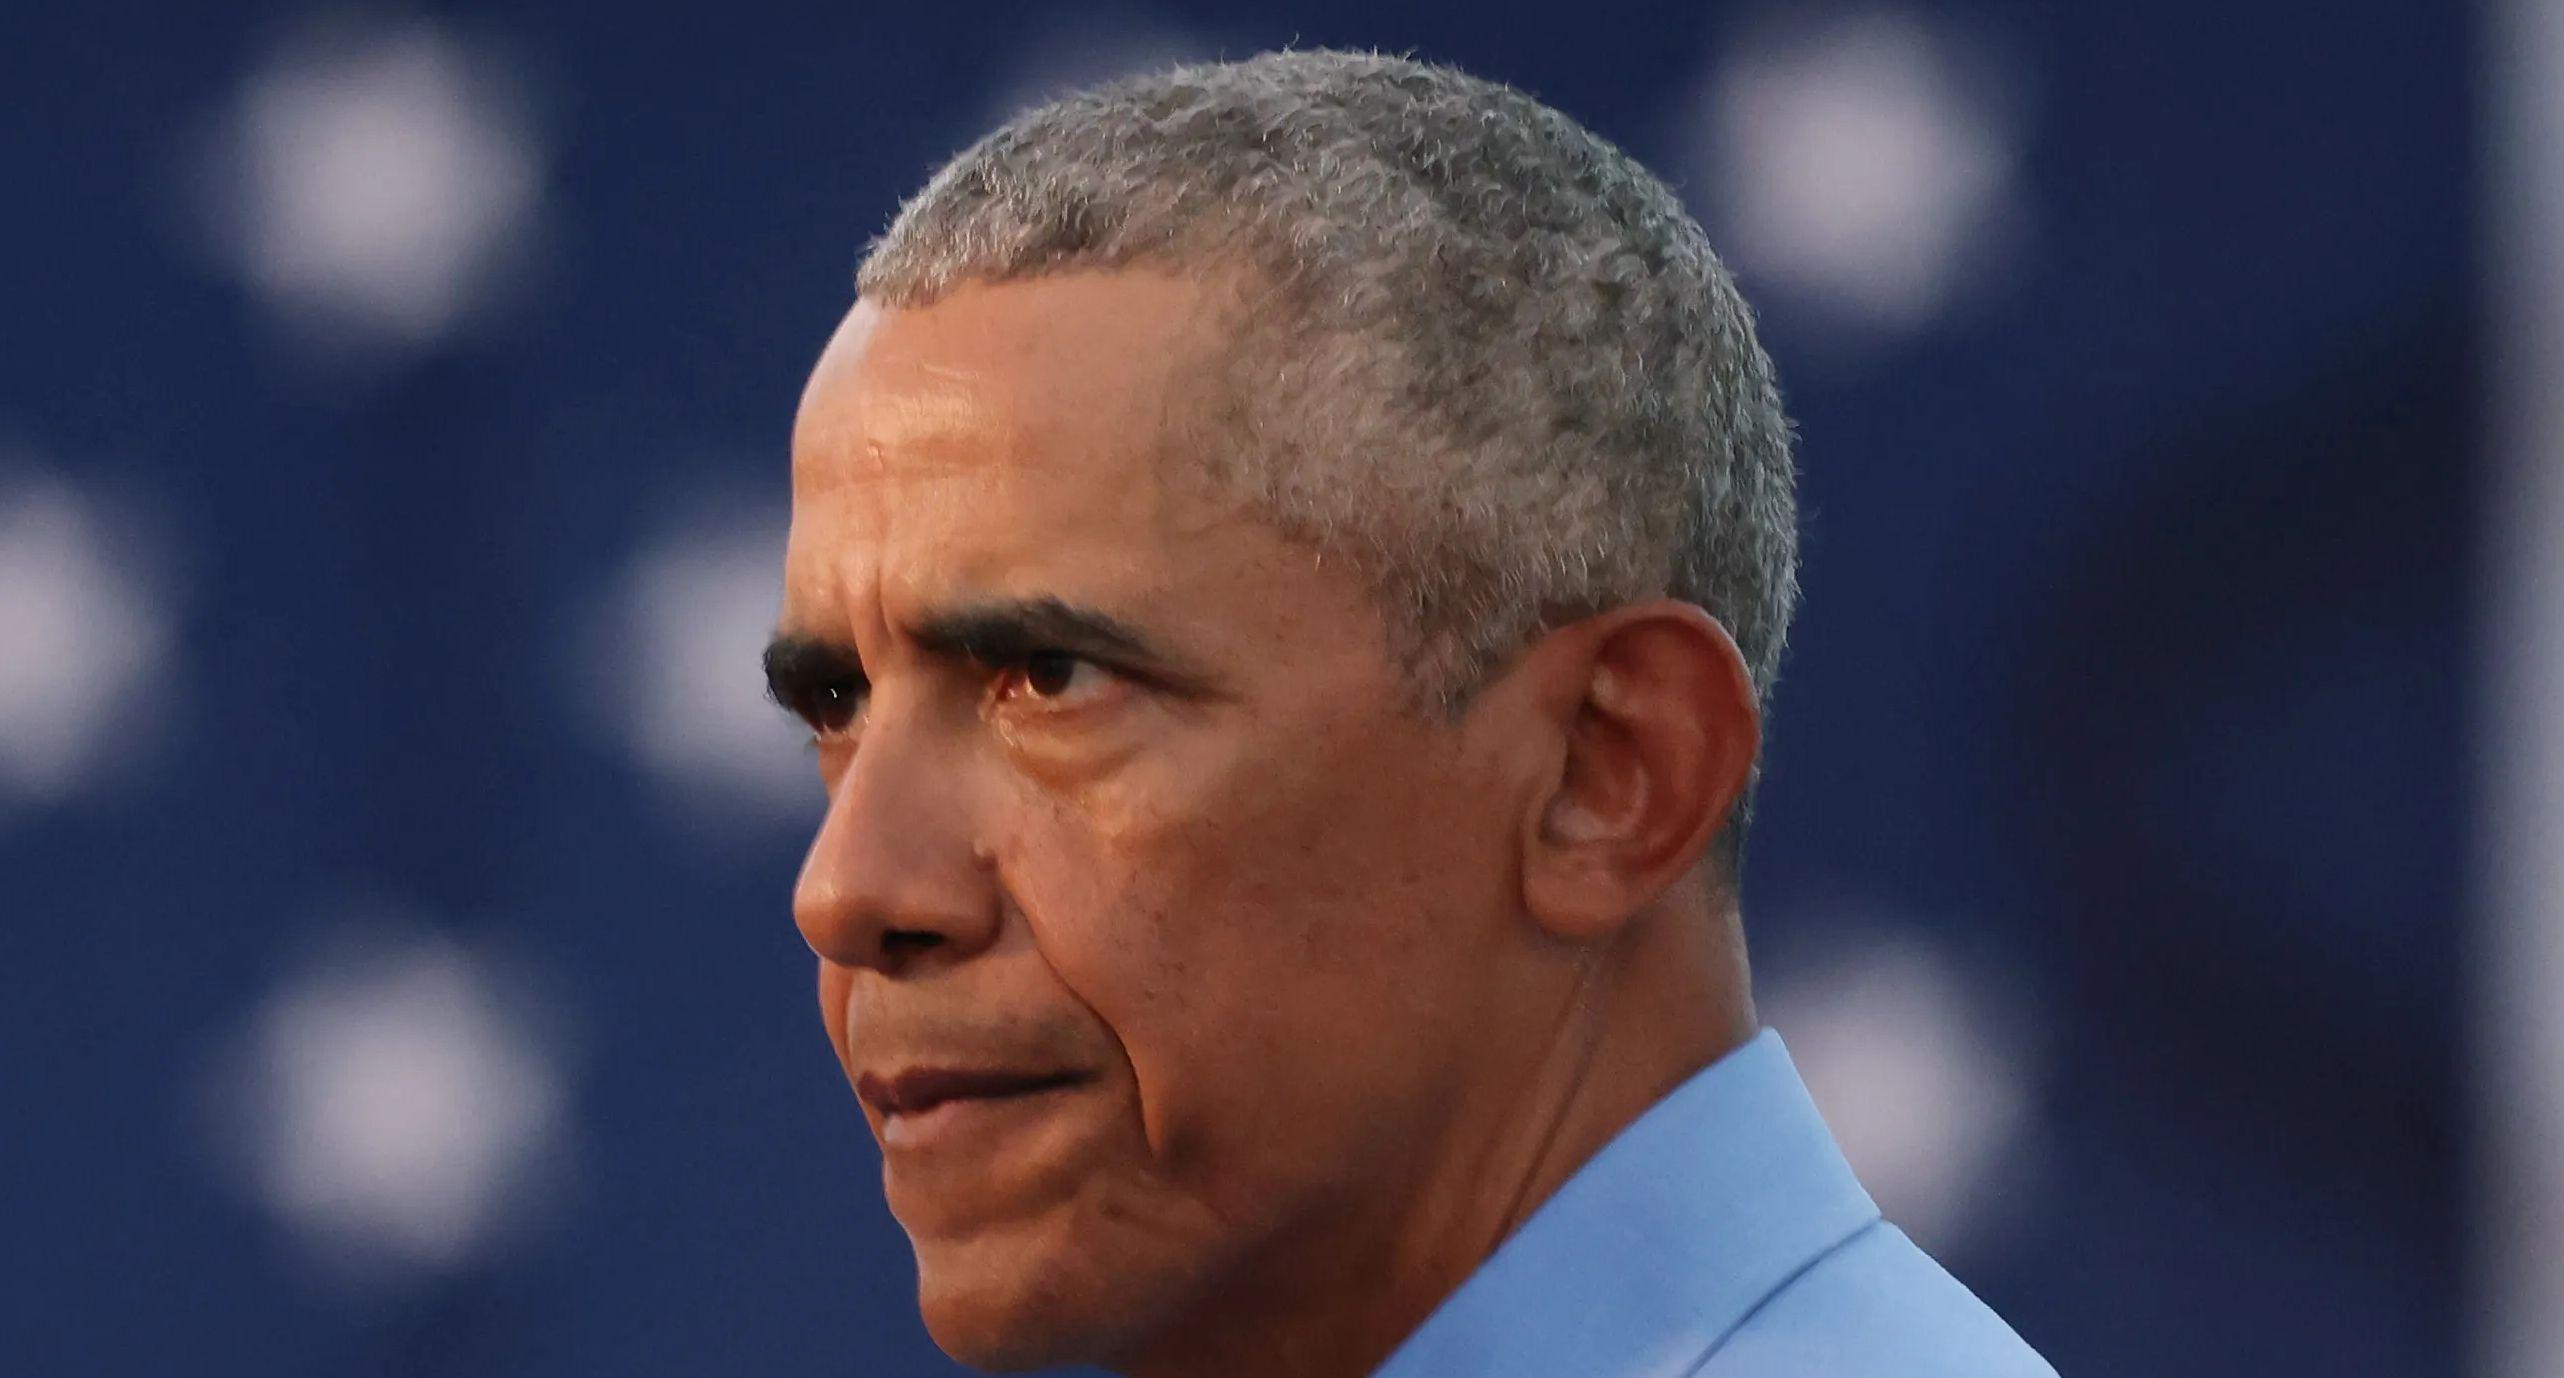 Former President Barack Obama looks on.